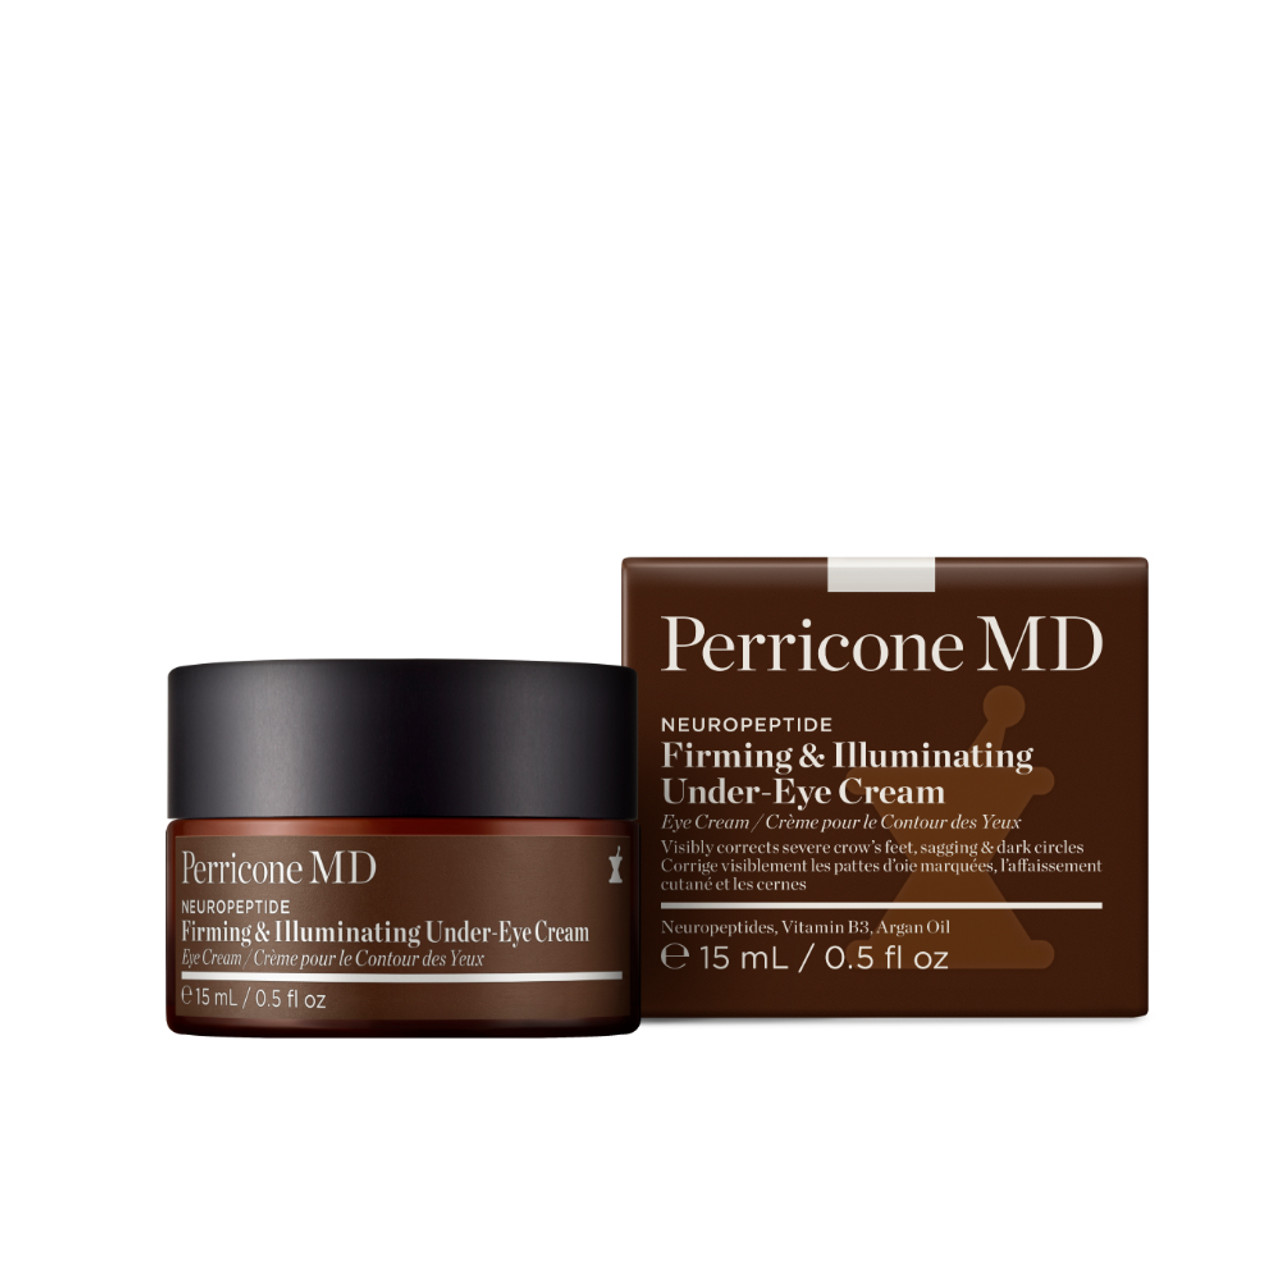 Perricone MD Neuropeptide Firming & Illuminating Under Eye